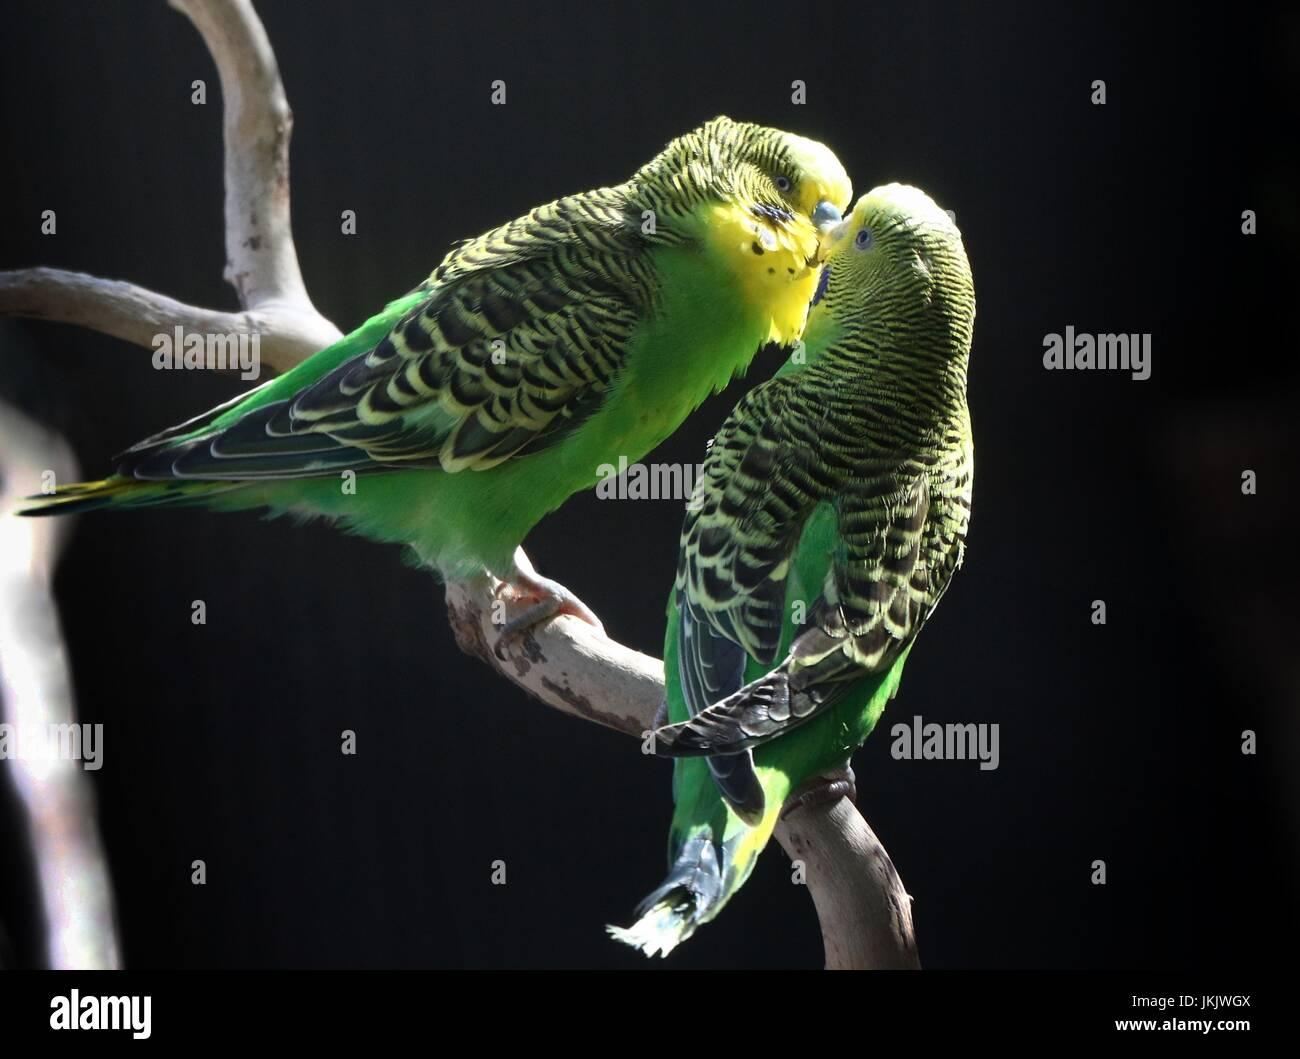 Par de cortejo Budgericar australianos periquitos (Melopsittacus undulatus) en primer plano. Imagen De Stock